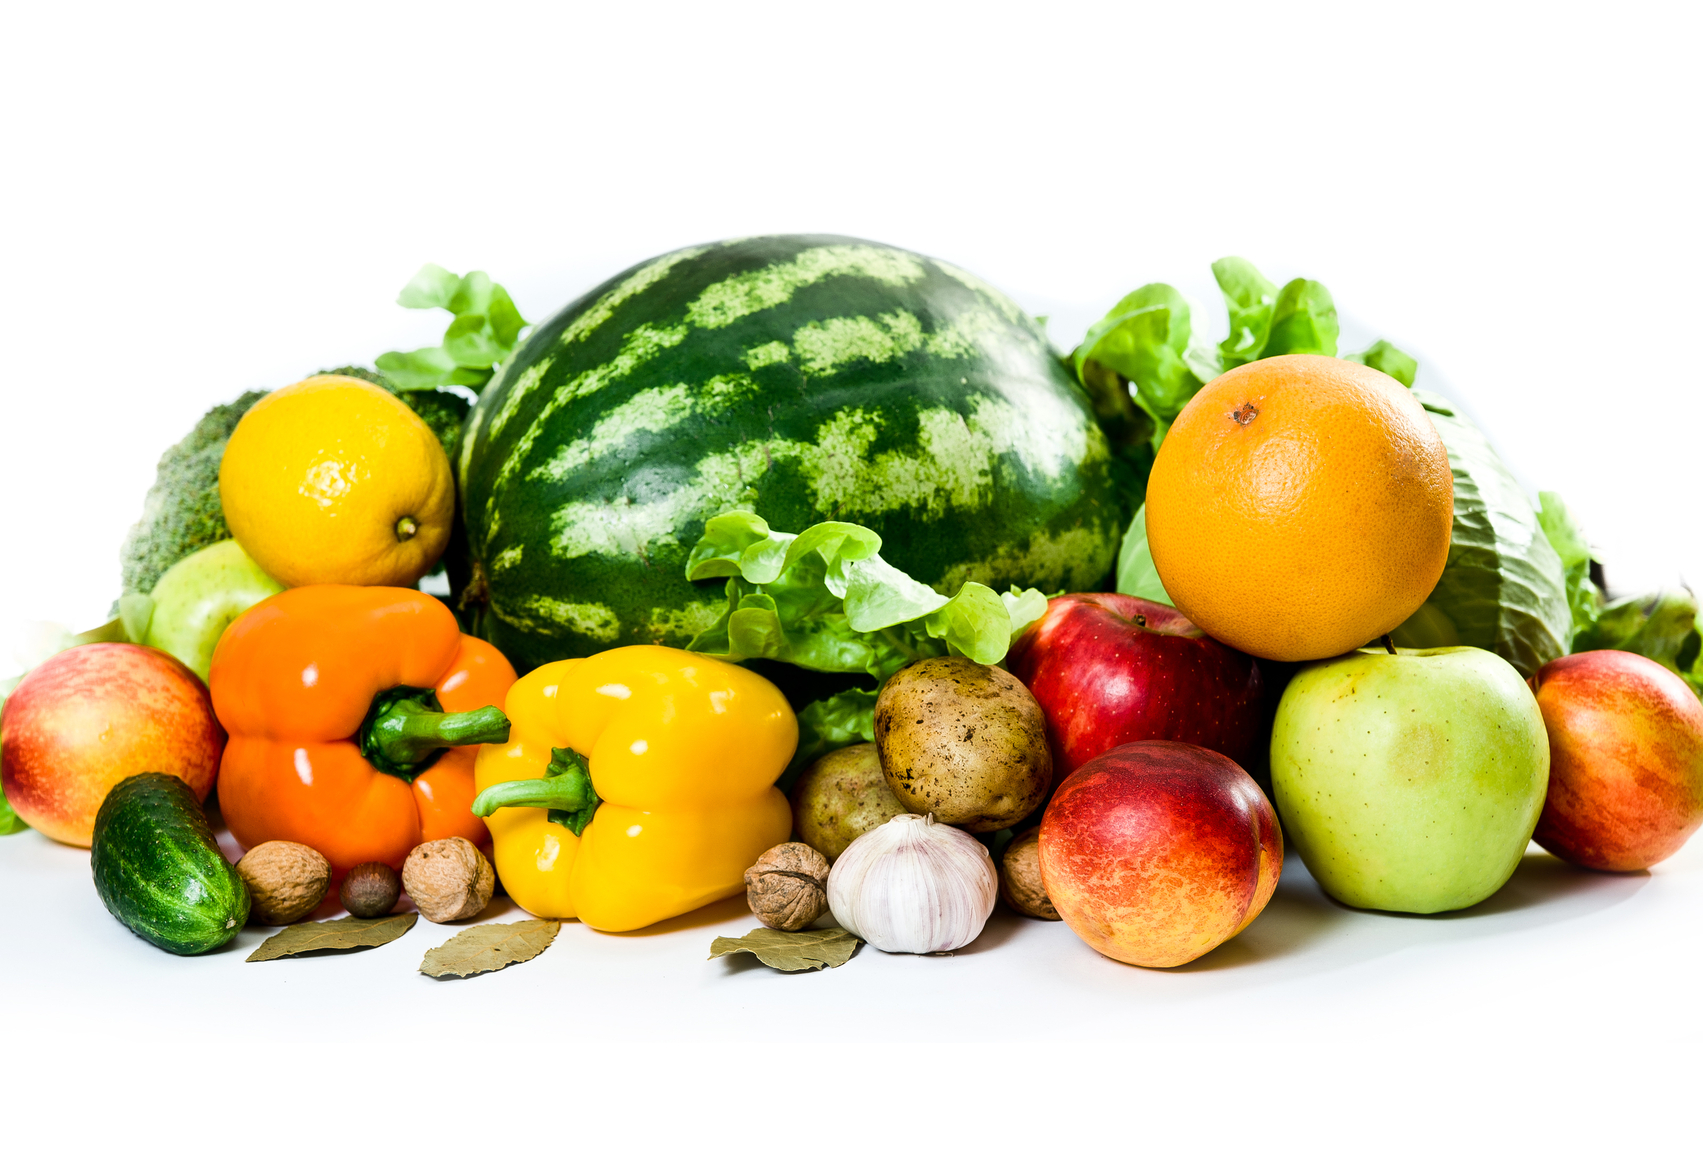 Faktor Ernährung | Studio Top in Form